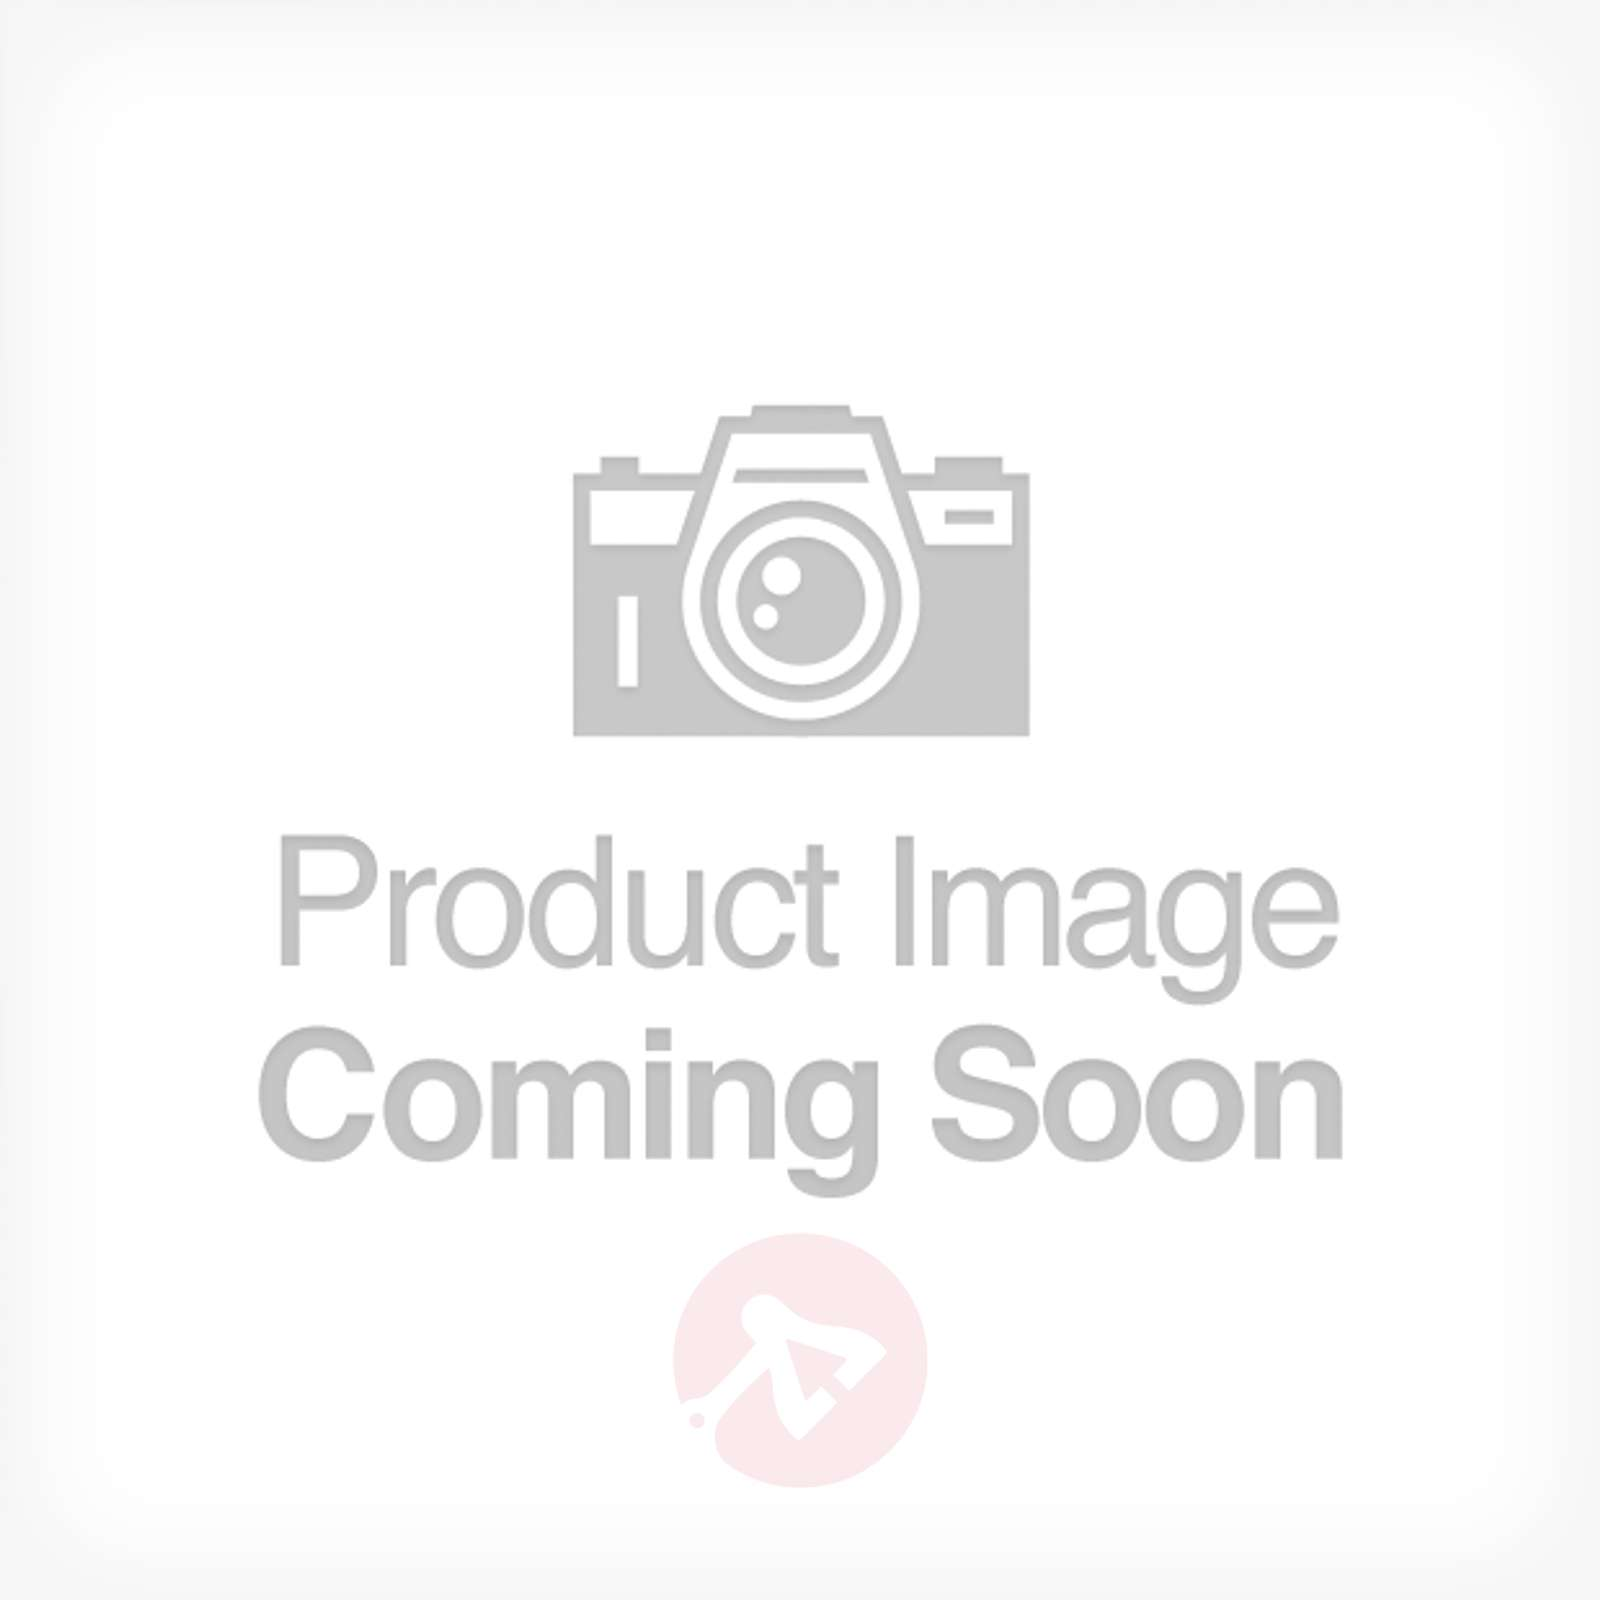 Anglepoise® Type 75 Mini table lamp Paul Smith-1073013X-03